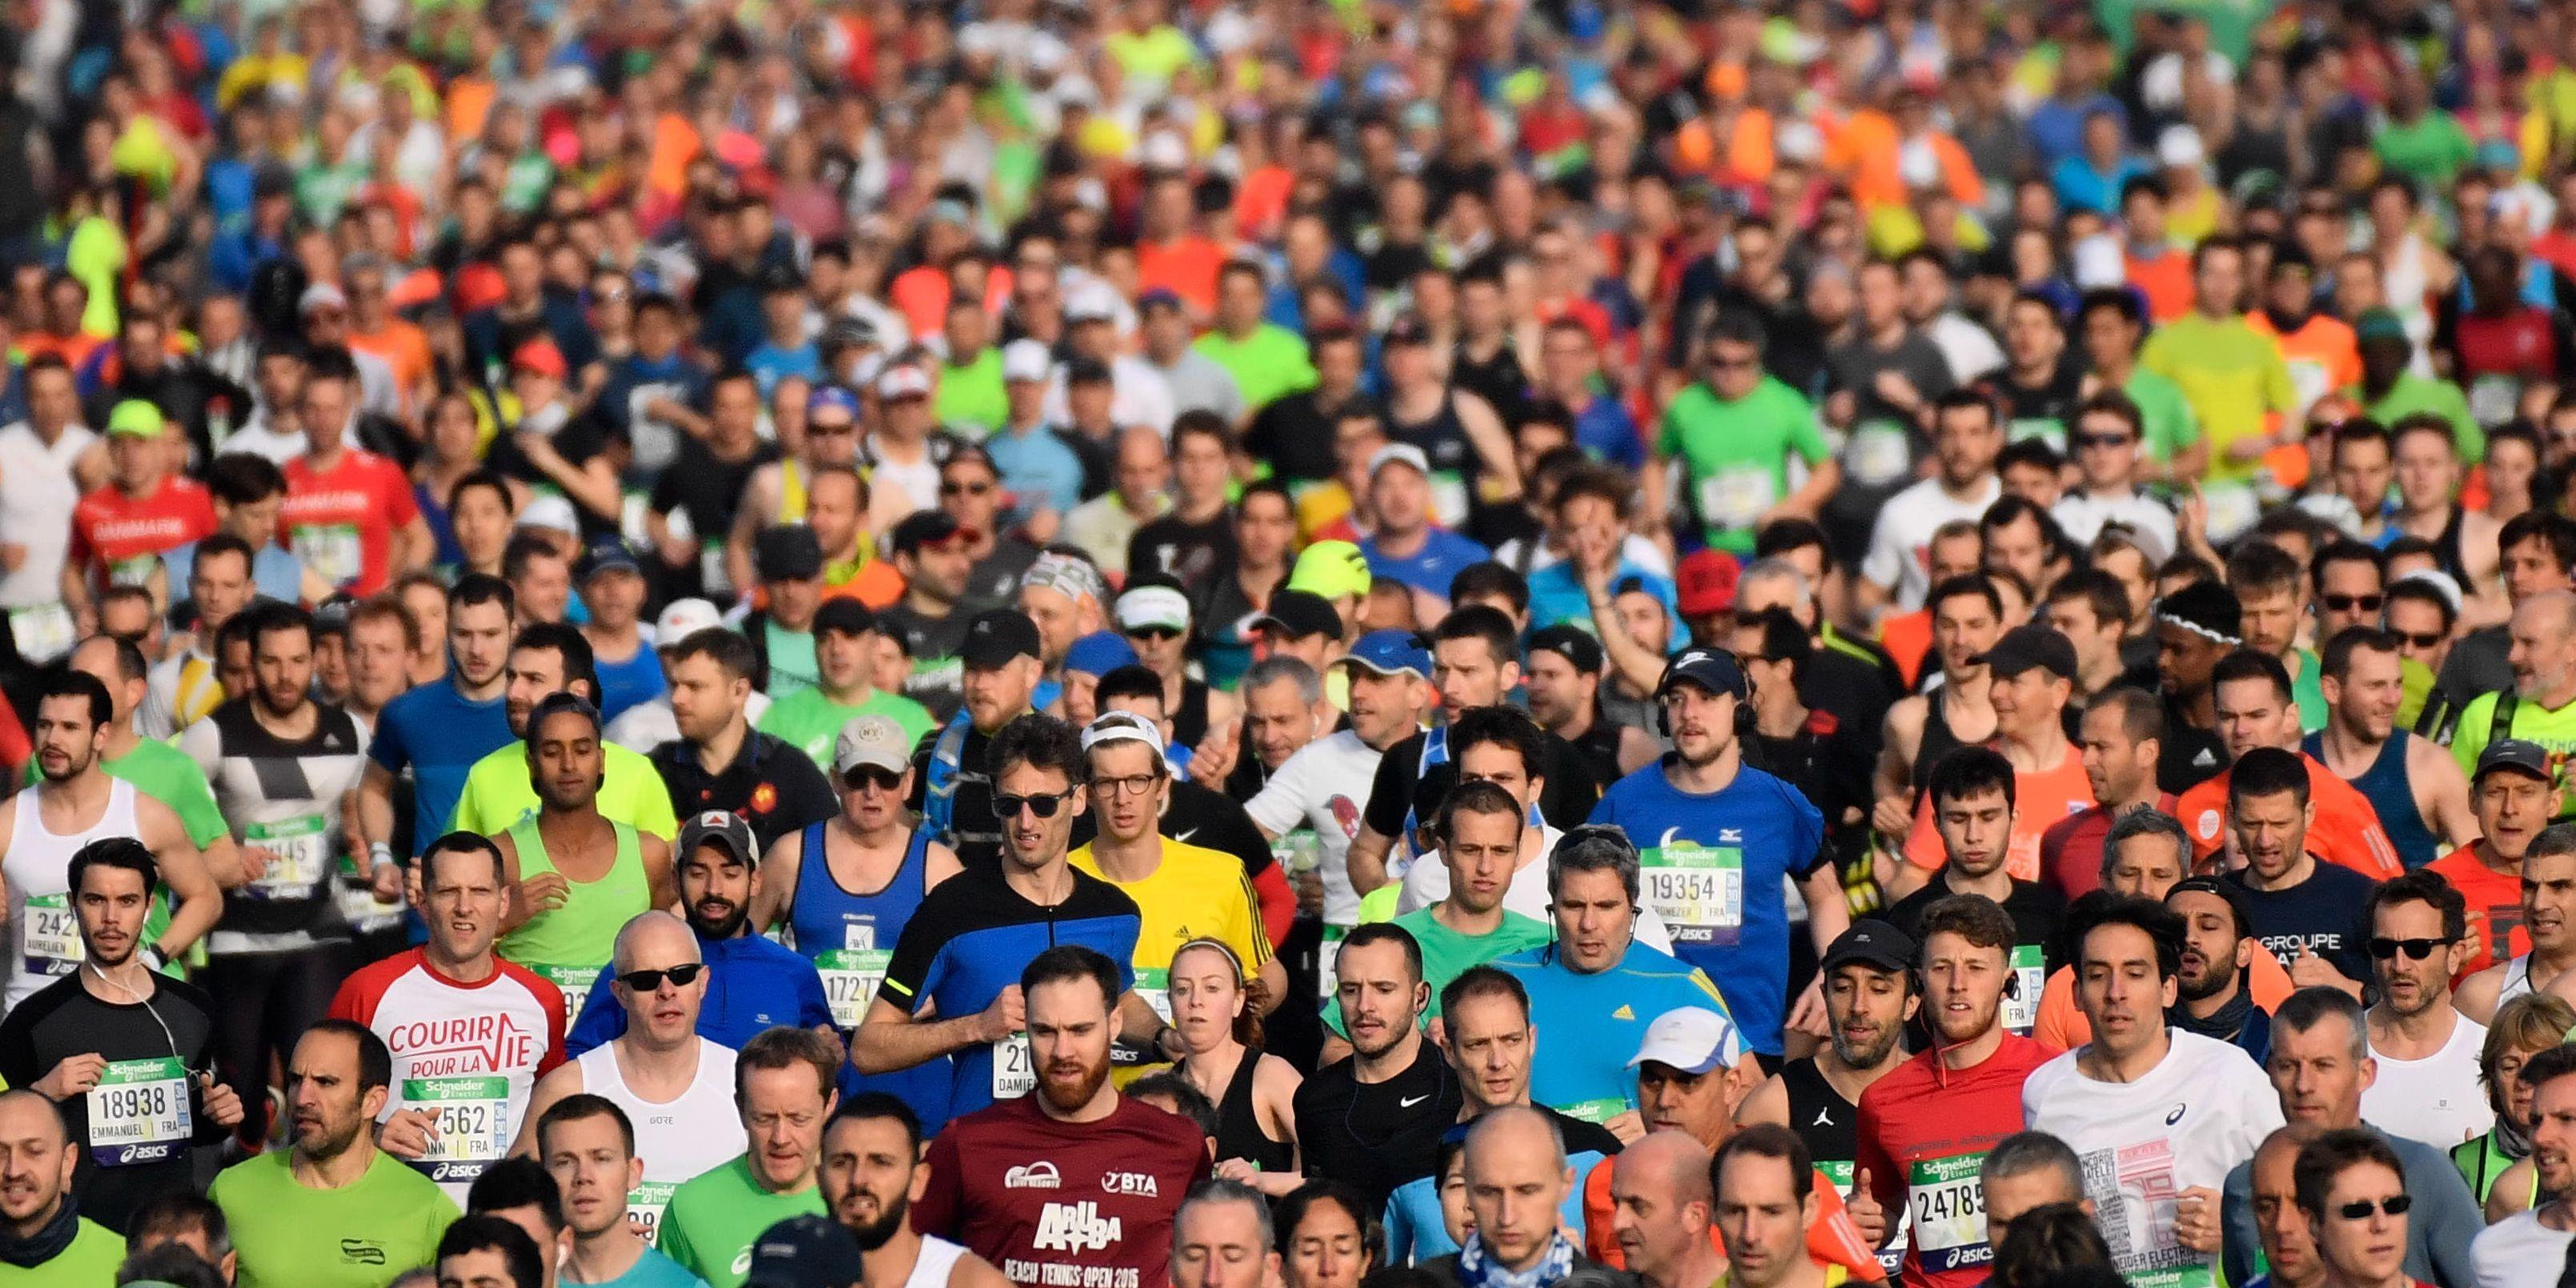 asics are making these major marathons greener